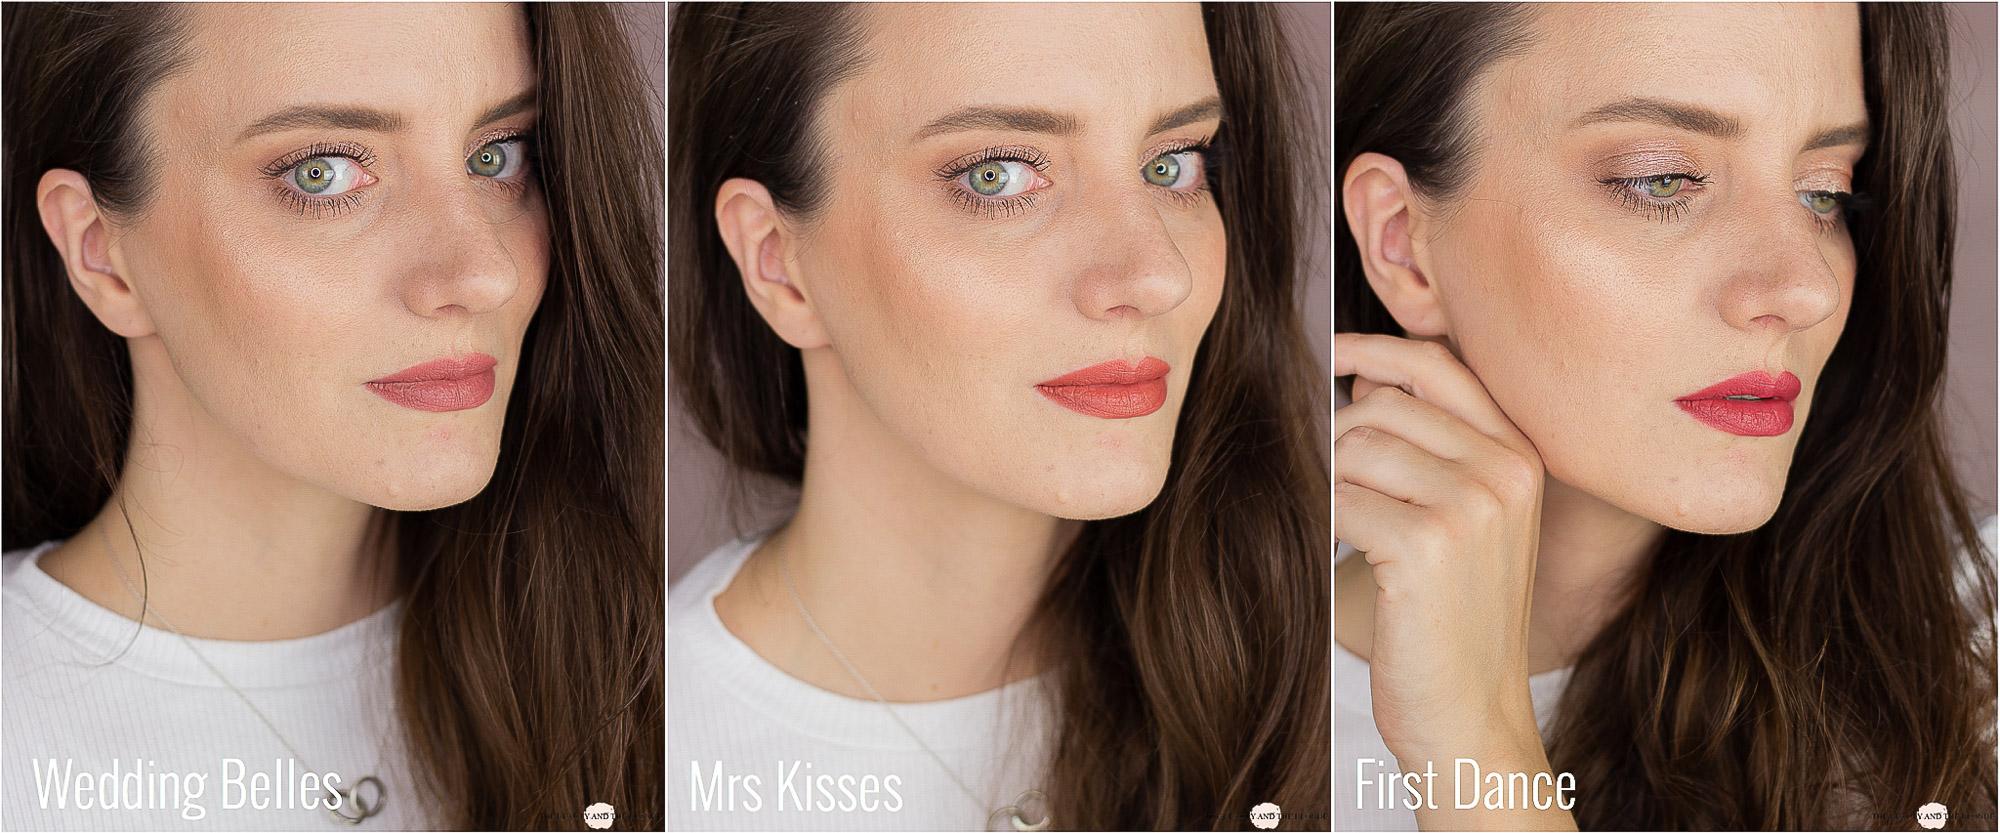 Charlotte Tilbury Love Filter Collection Matte Revolution Lipsticks Swatches